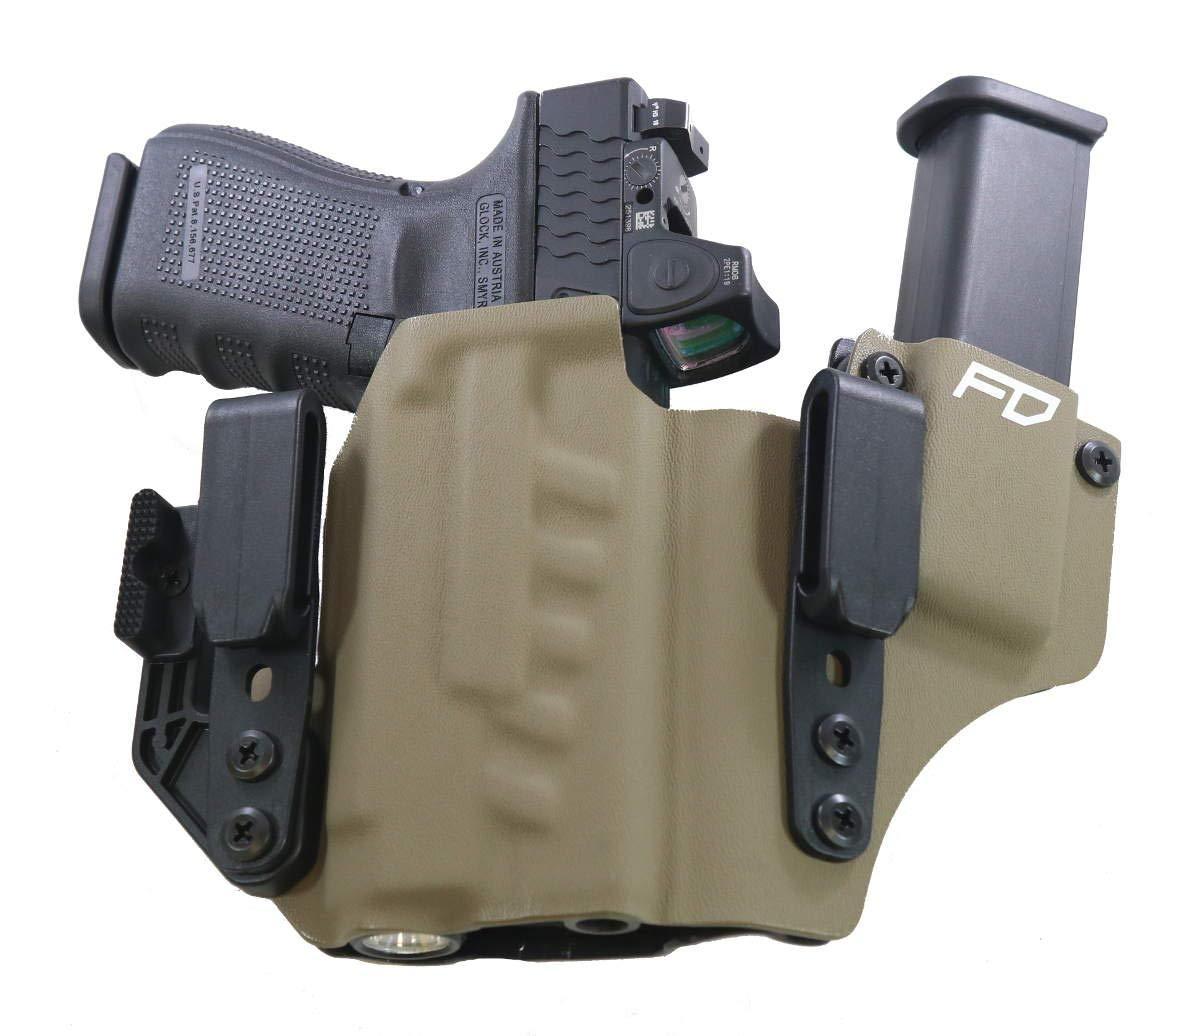 Fierce Defender IWB Kydex Holster Glock 19 23 32 w/APLc +1 Series w/Claw  -Made in USA- Gen 5 Compatible